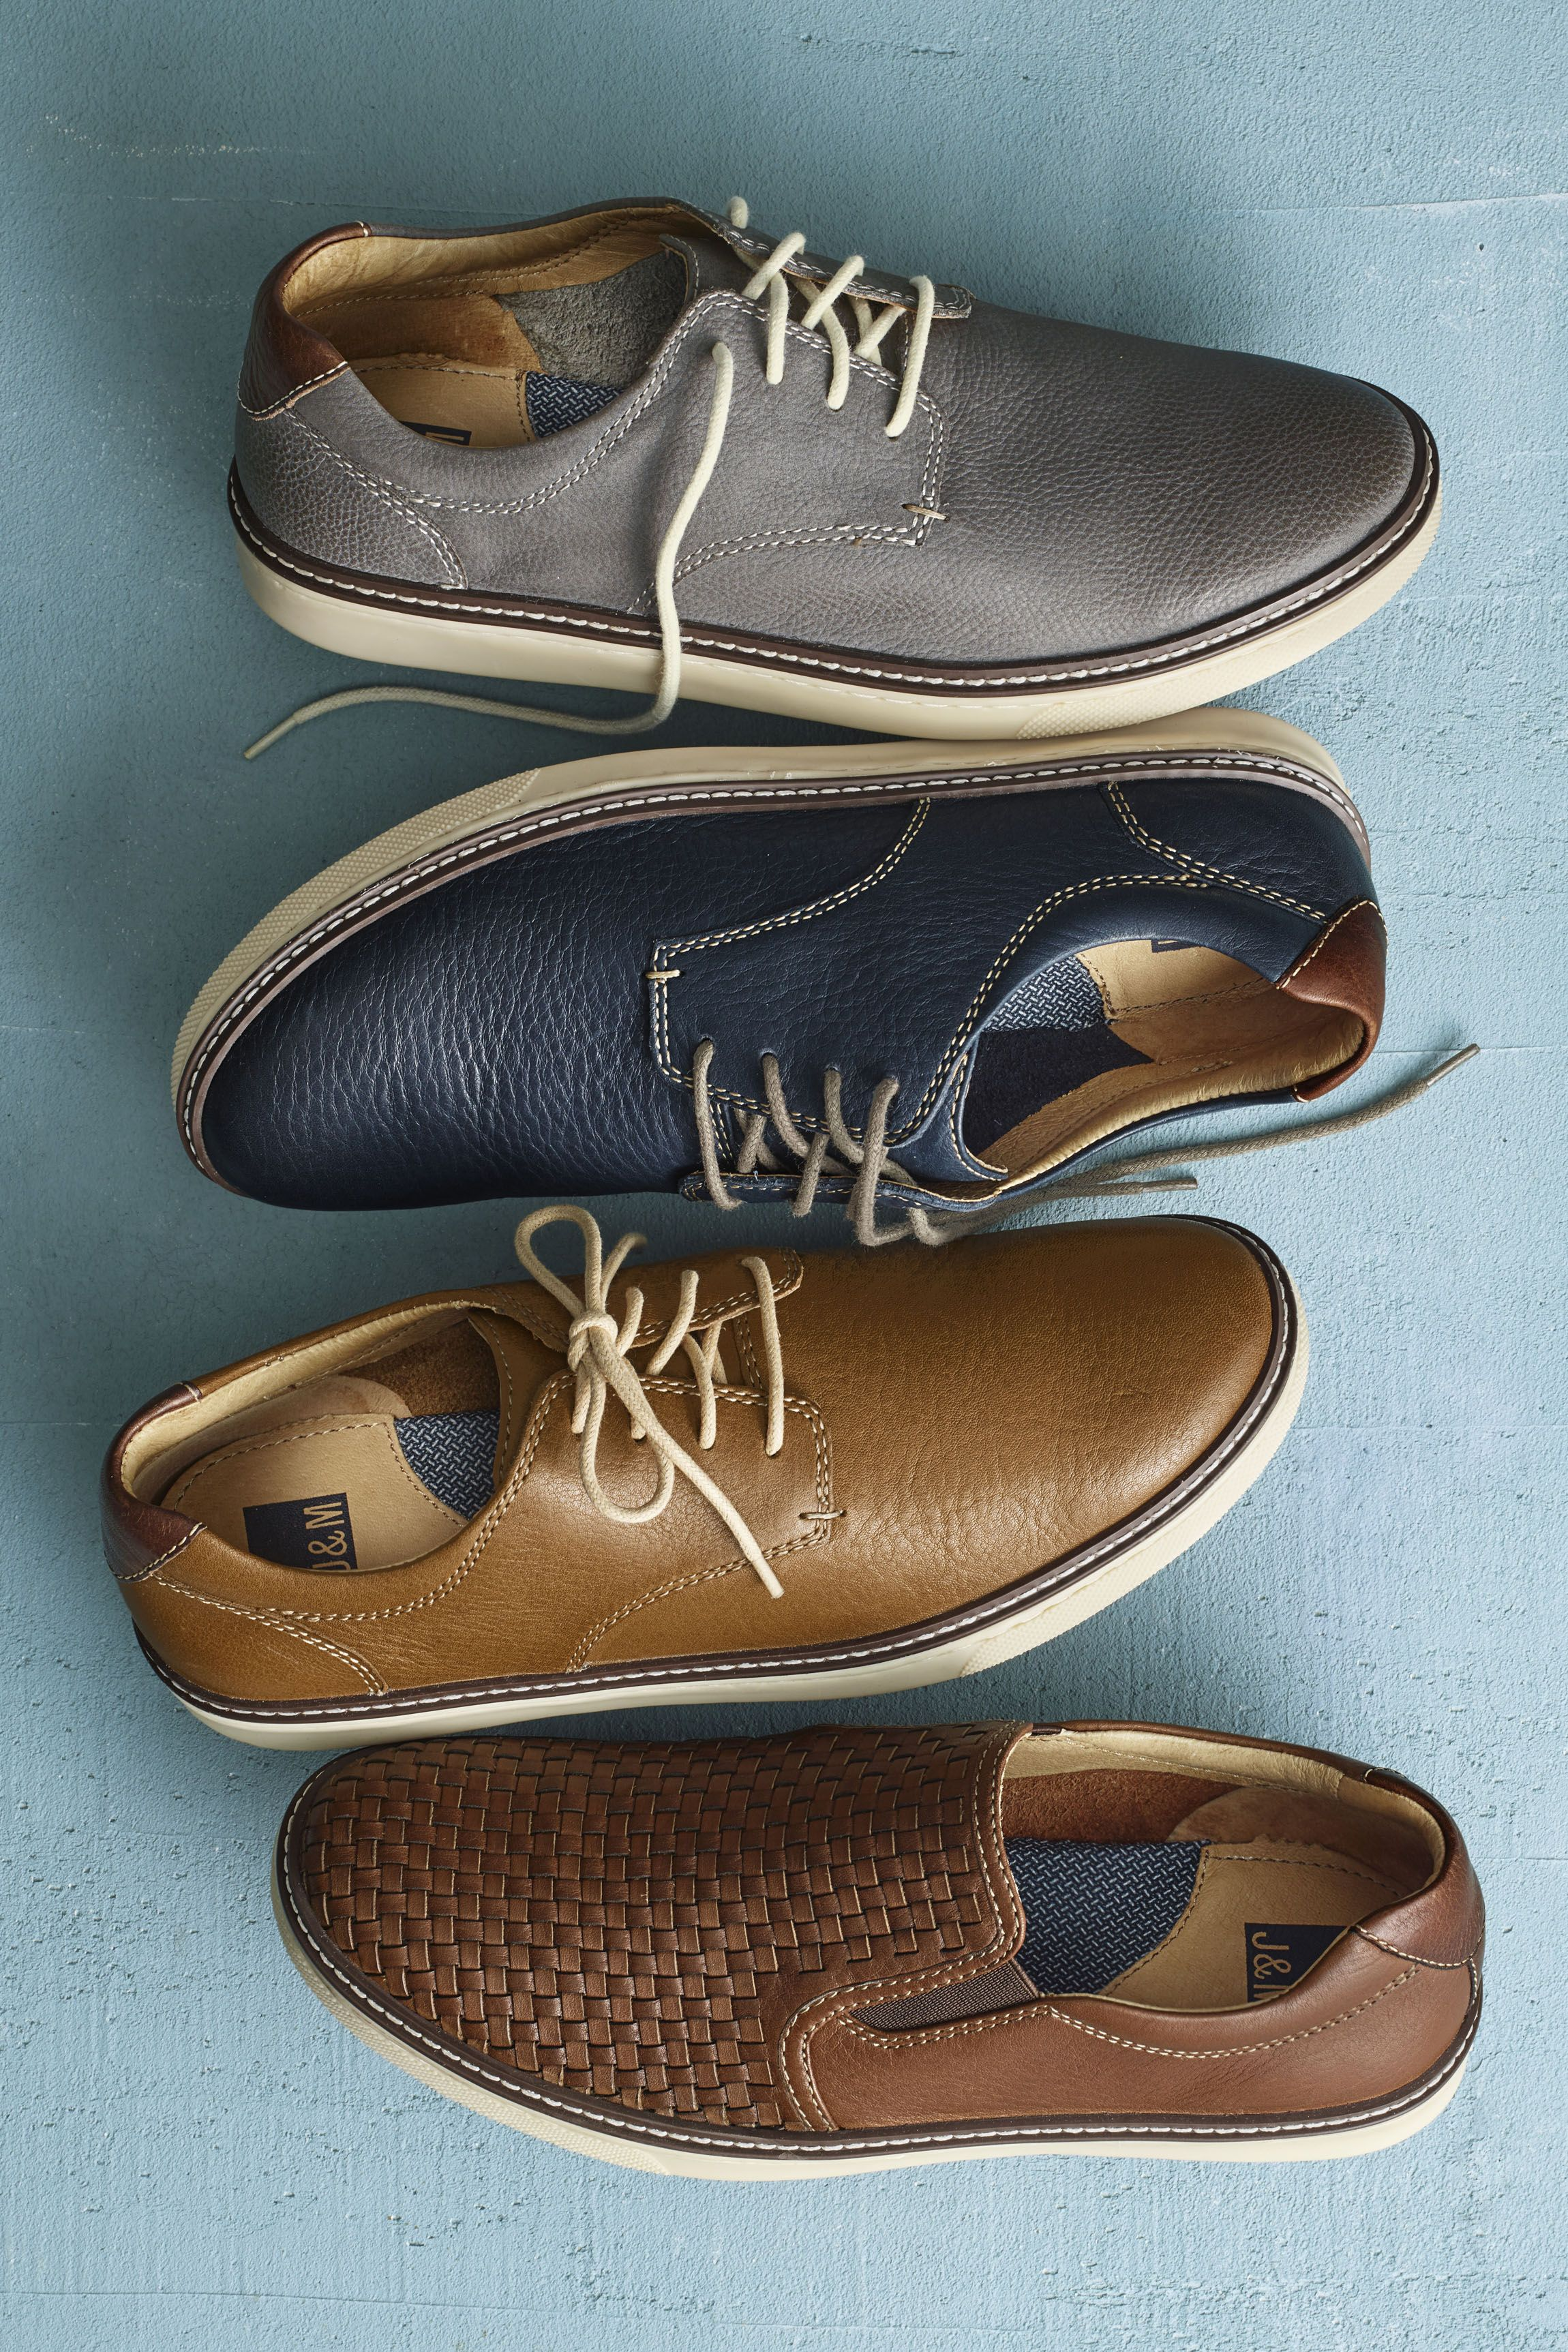 Mens summer shoes, Mens fashion shoes